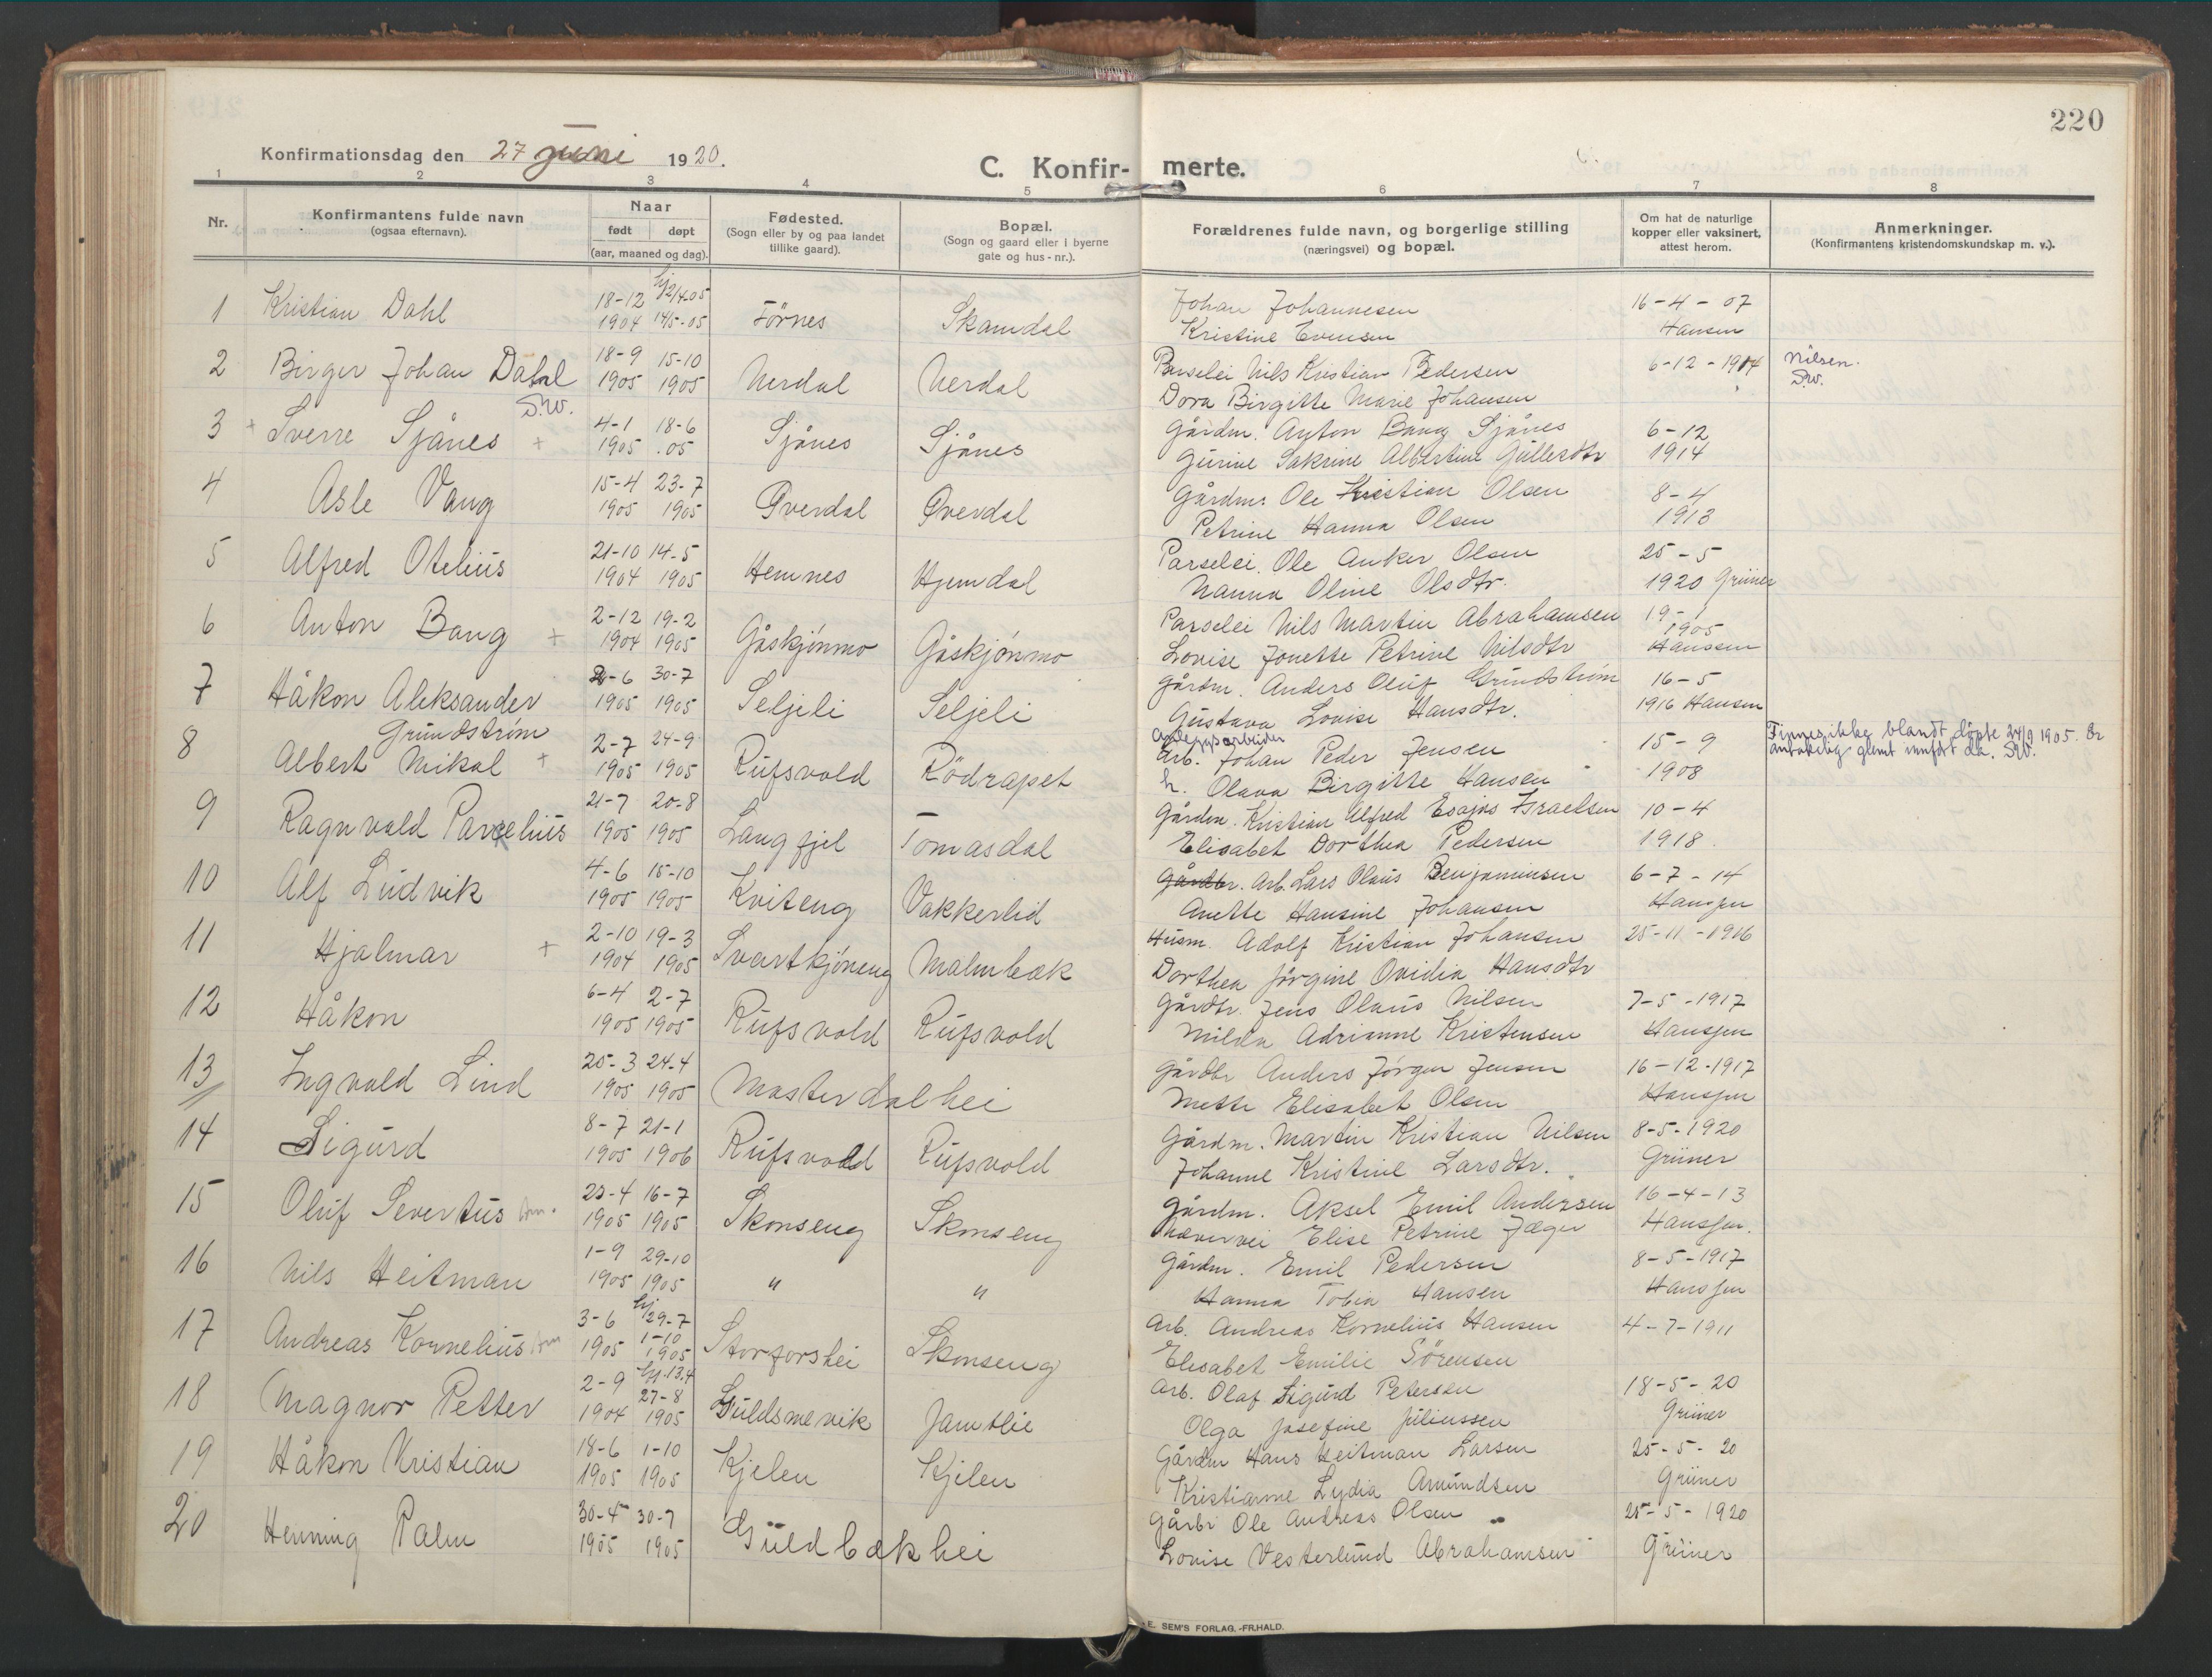 SAT, Ministerialprotokoller, klokkerbøker og fødselsregistre - Nordland, 827/L0404: Ministerialbok nr. 827A16, 1912-1925, s. 220